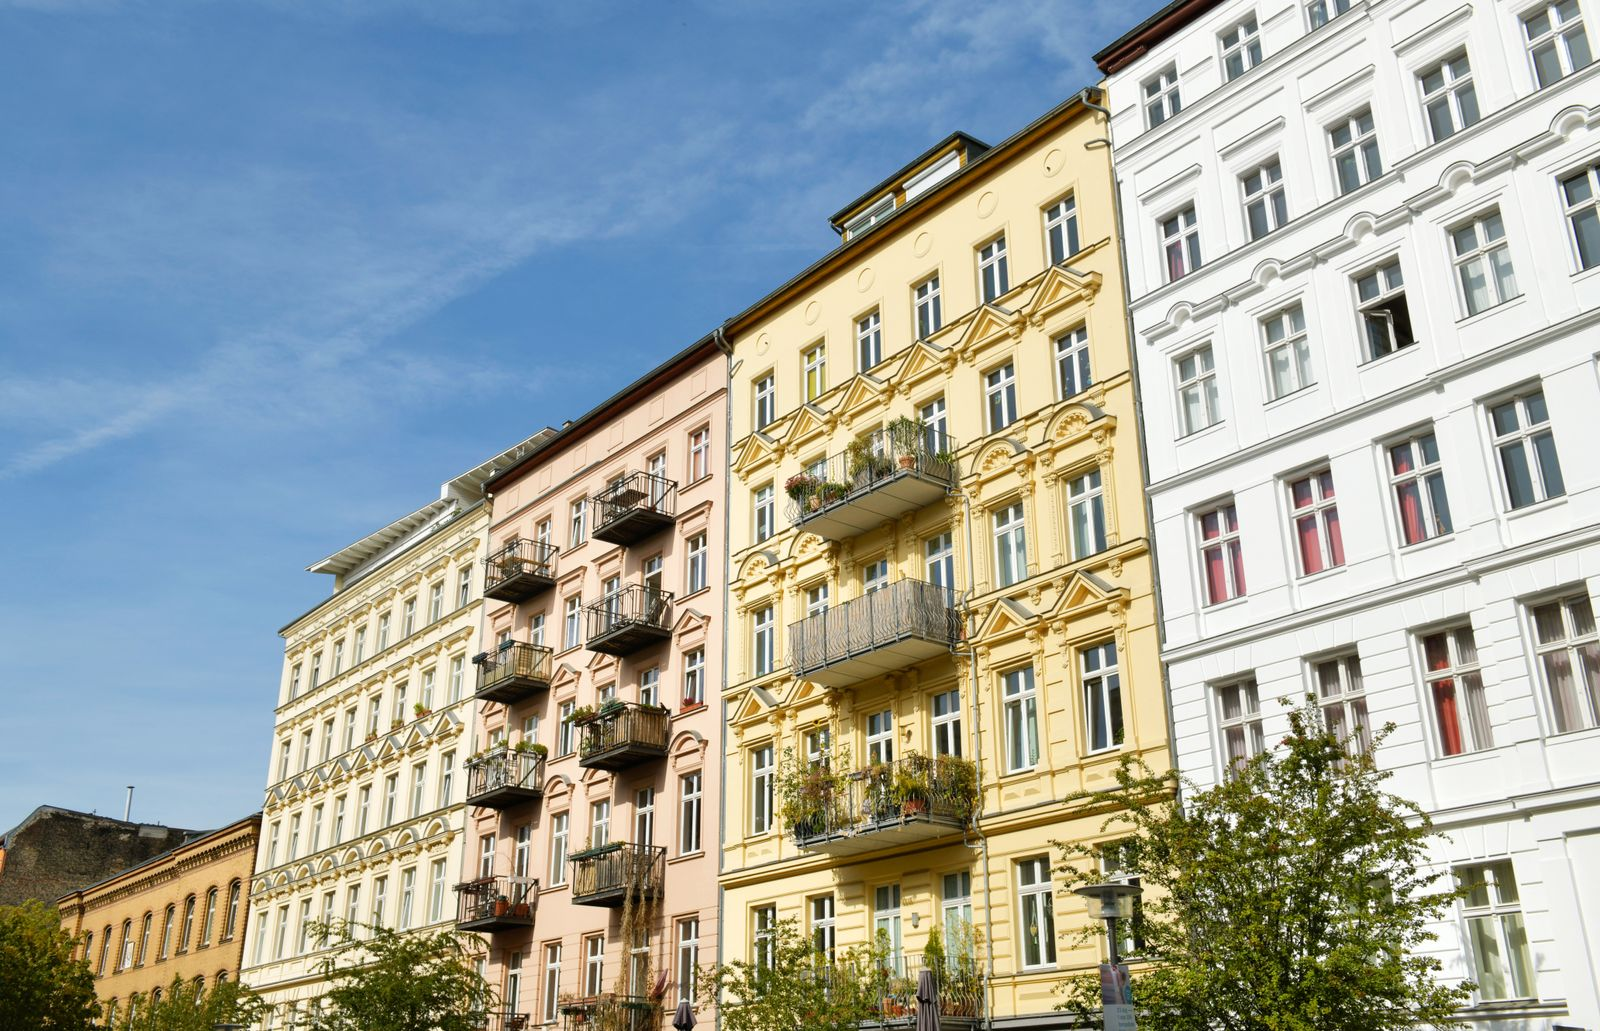 Altbauten, Oderberger Strasse, Prenzlauer Berg, Pankow, Berlin, Deutschland *** Old buildings, Oderberger Strasse, Prenz